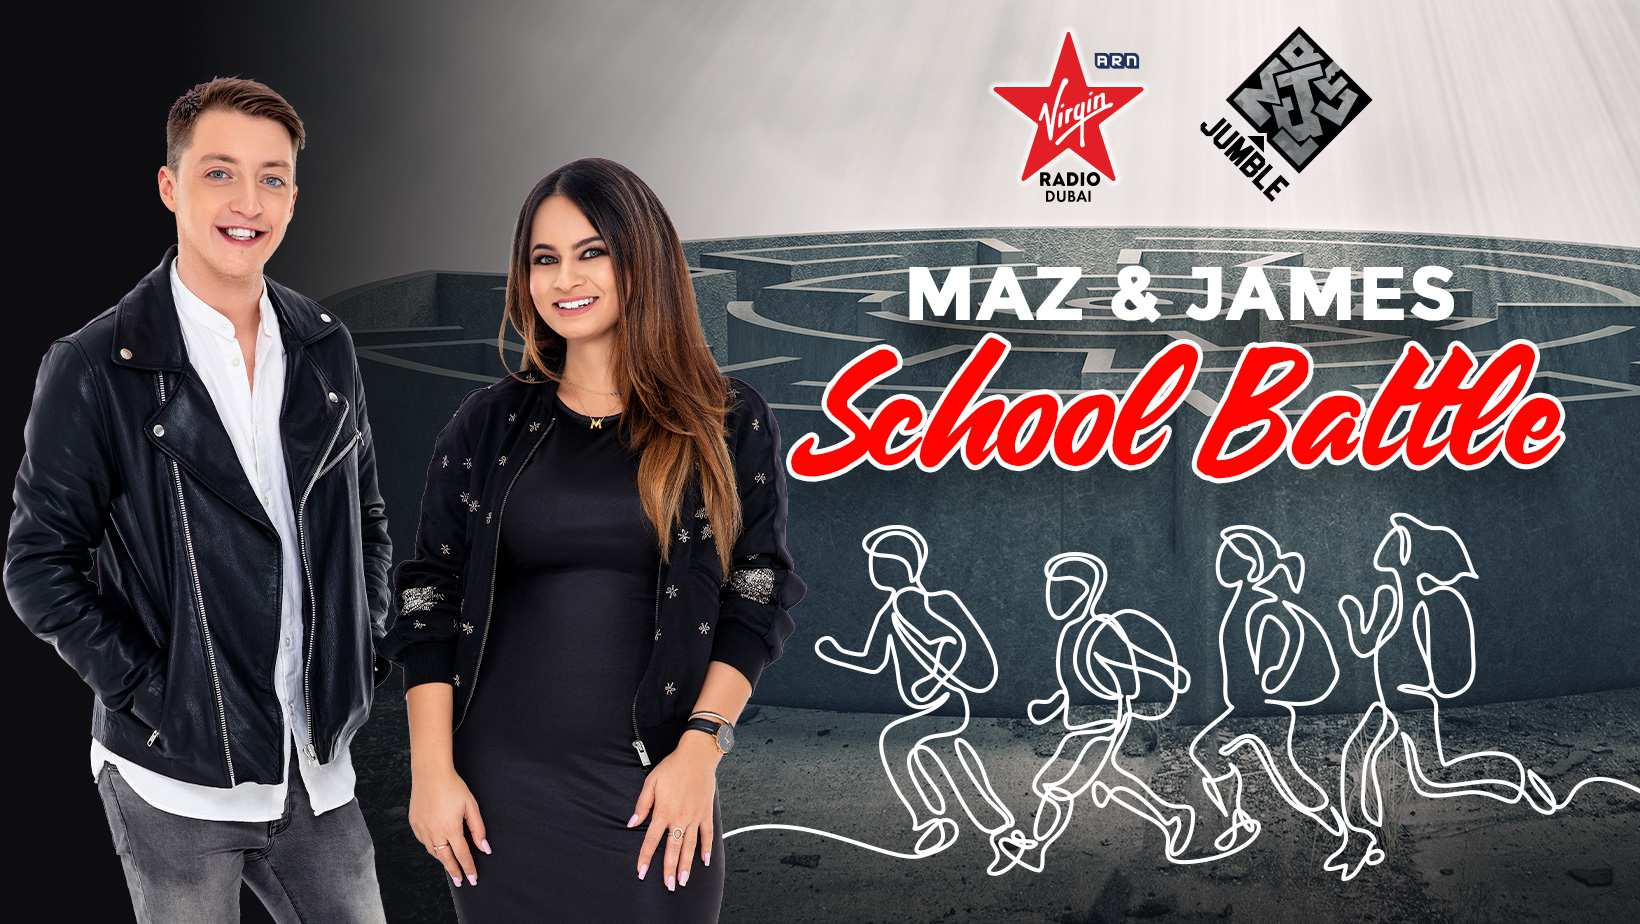 Maz & James School Battle